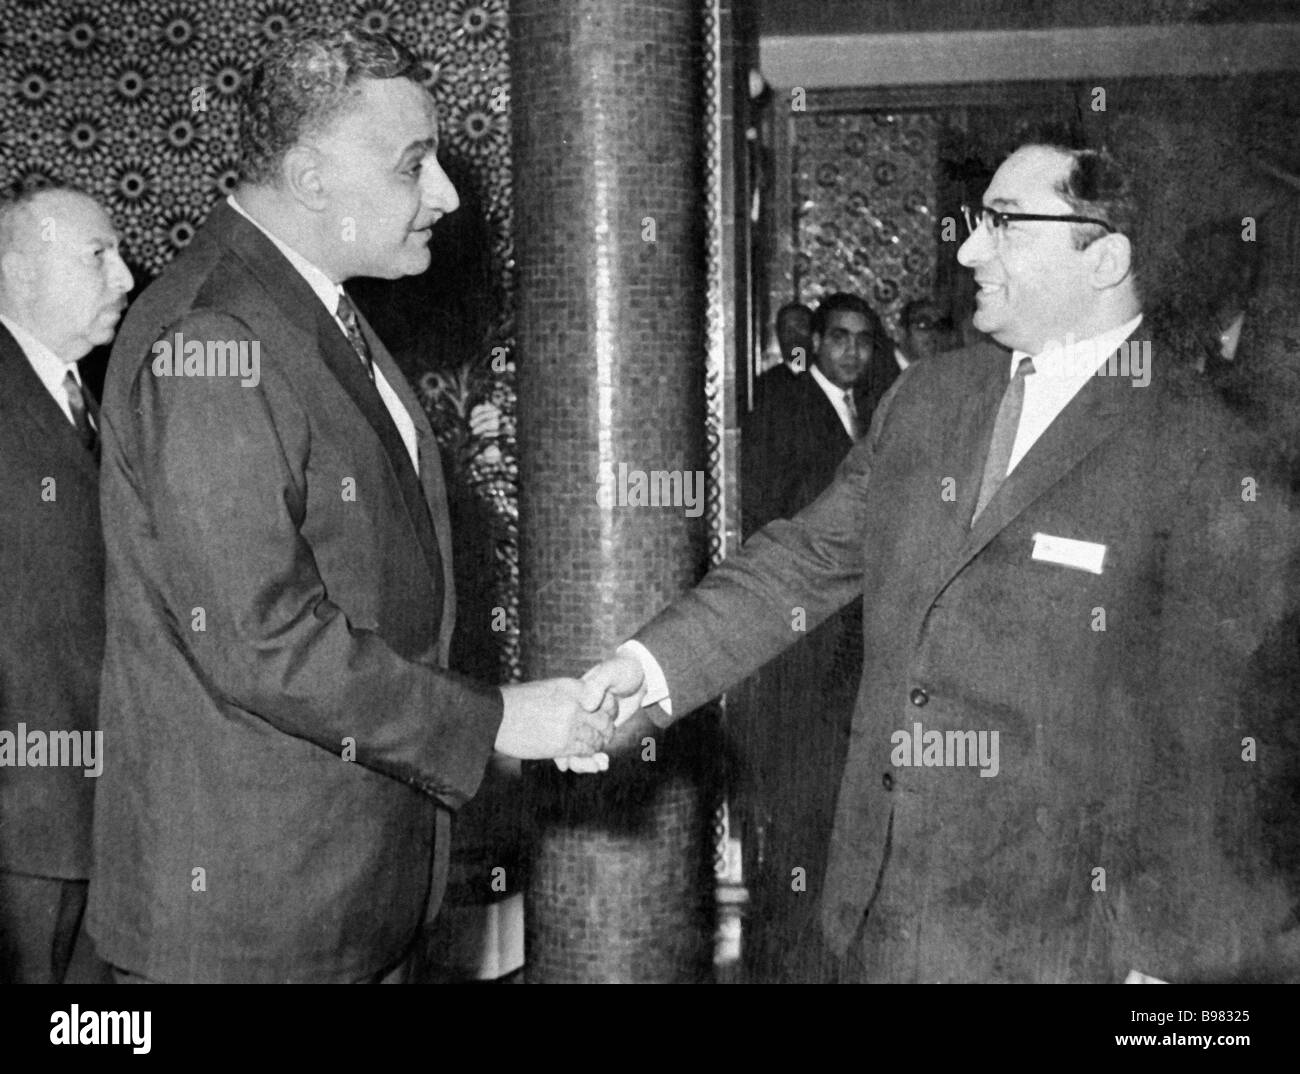 Egyptian President Gamal Abdel Nasser left greets Doctor of Philology and Arabic language professor Grigory Sharbatov - Stock Image